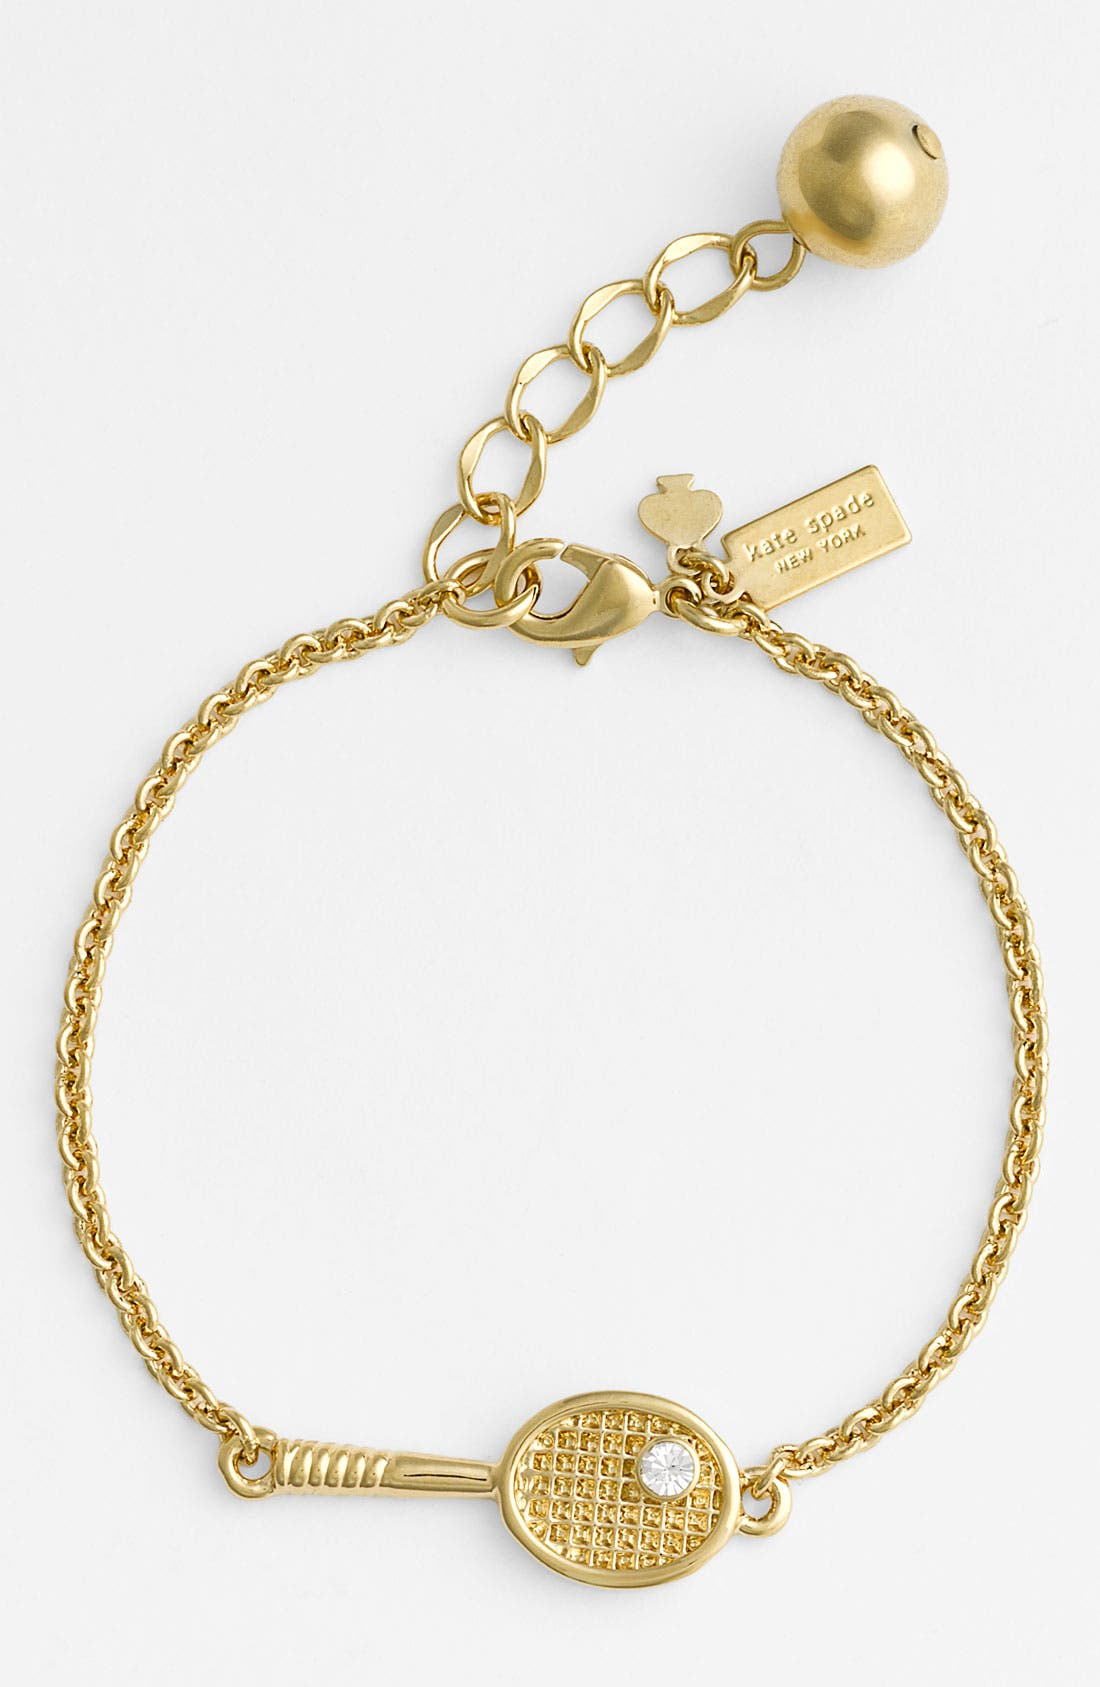 Main Image - kate spade new york 'match point' tennis bracelet